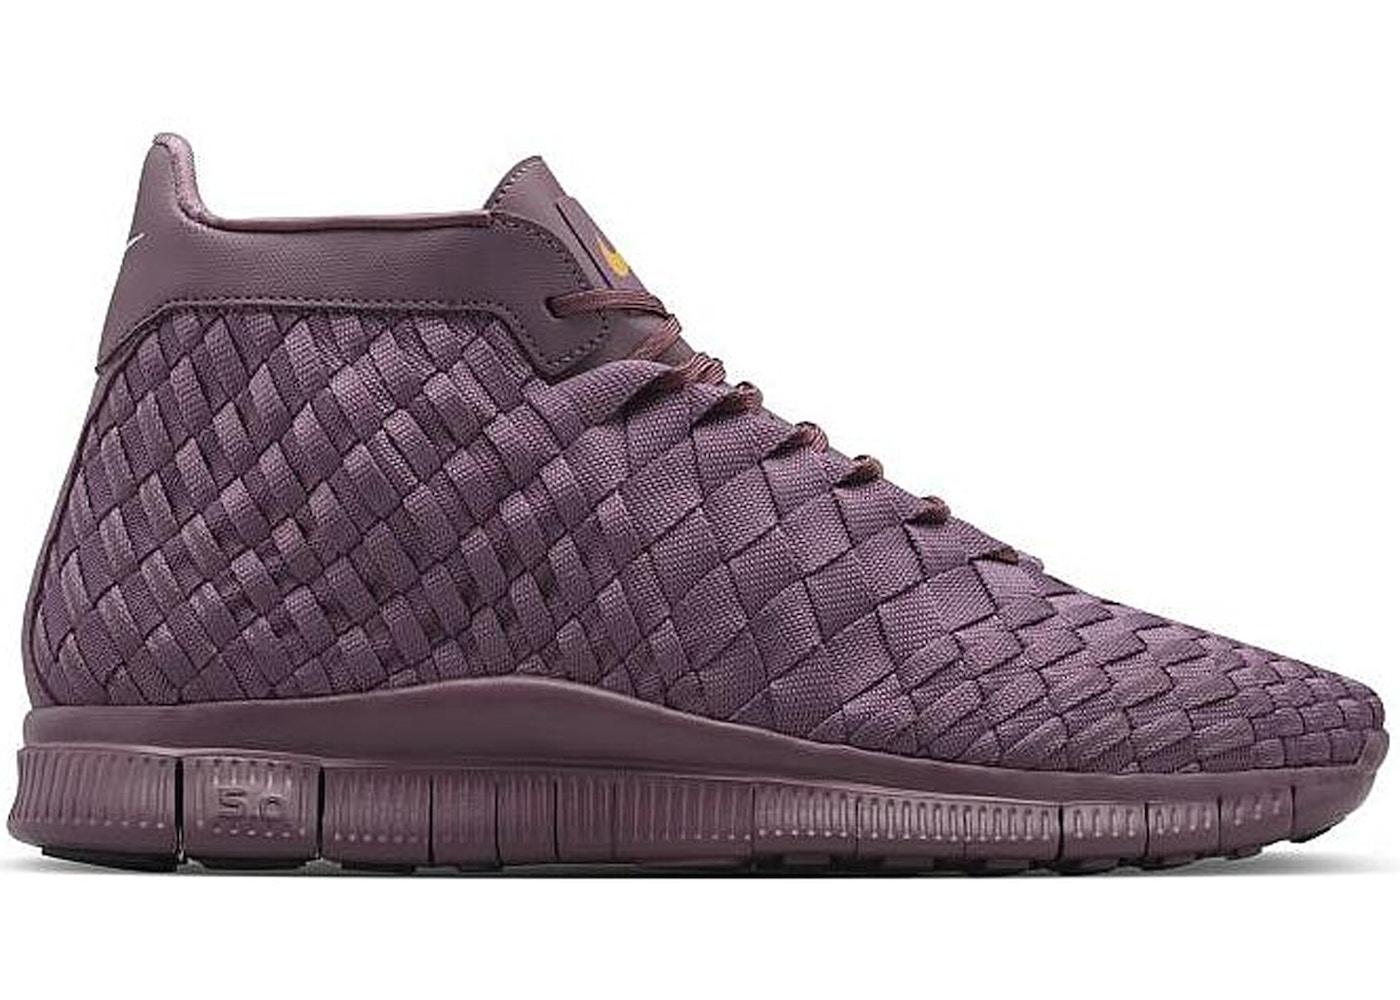 new concept 8daa4 1c03d Nike Free Inneva Woven Mid Purple - 800907-550